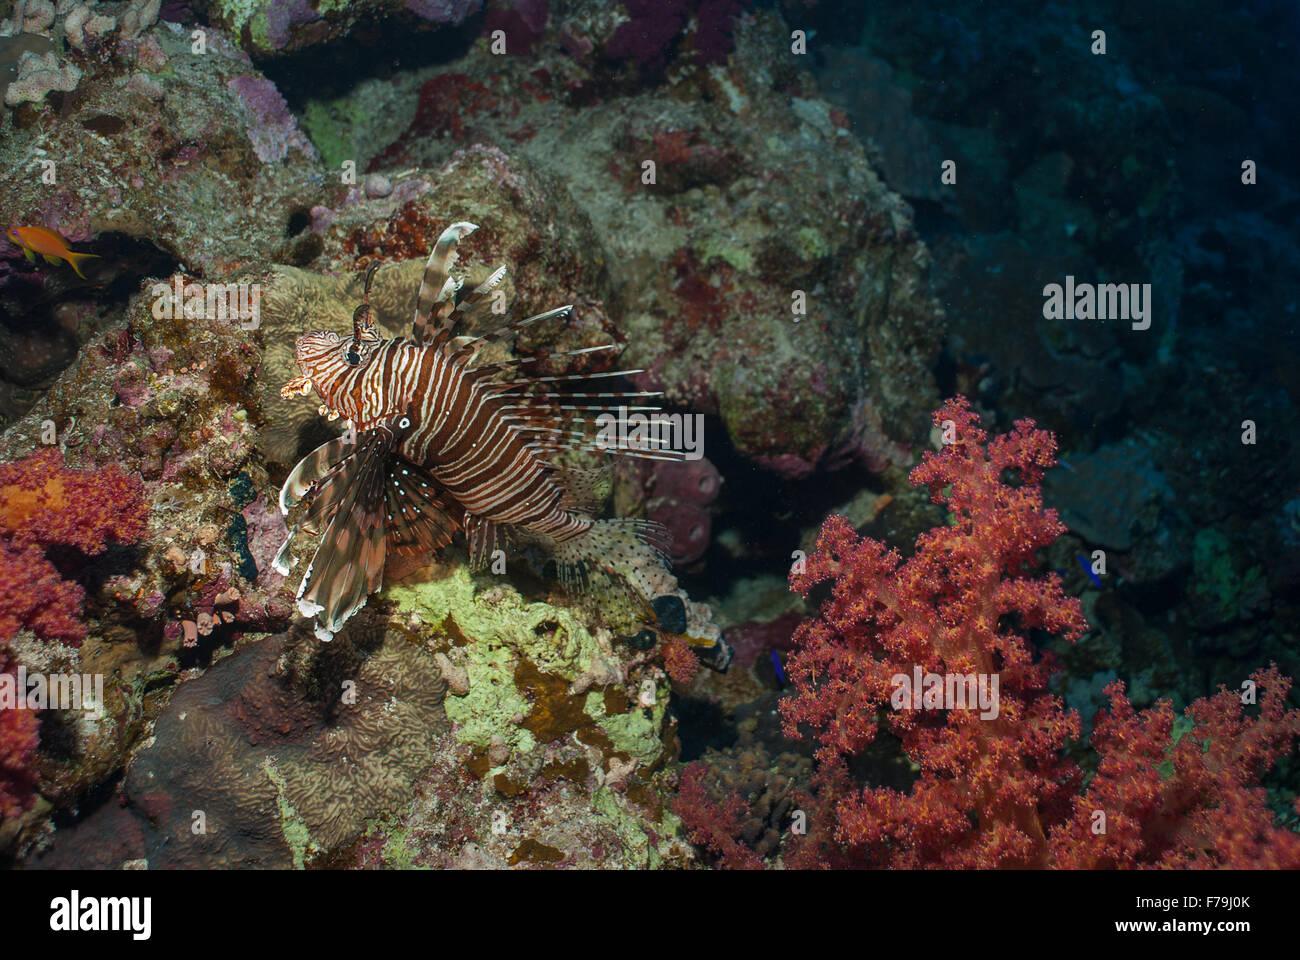 Lion fish, Pterois miles, Scorpenidae, Sharm el Sheikh, Red Sea, Egypt - Stock Image